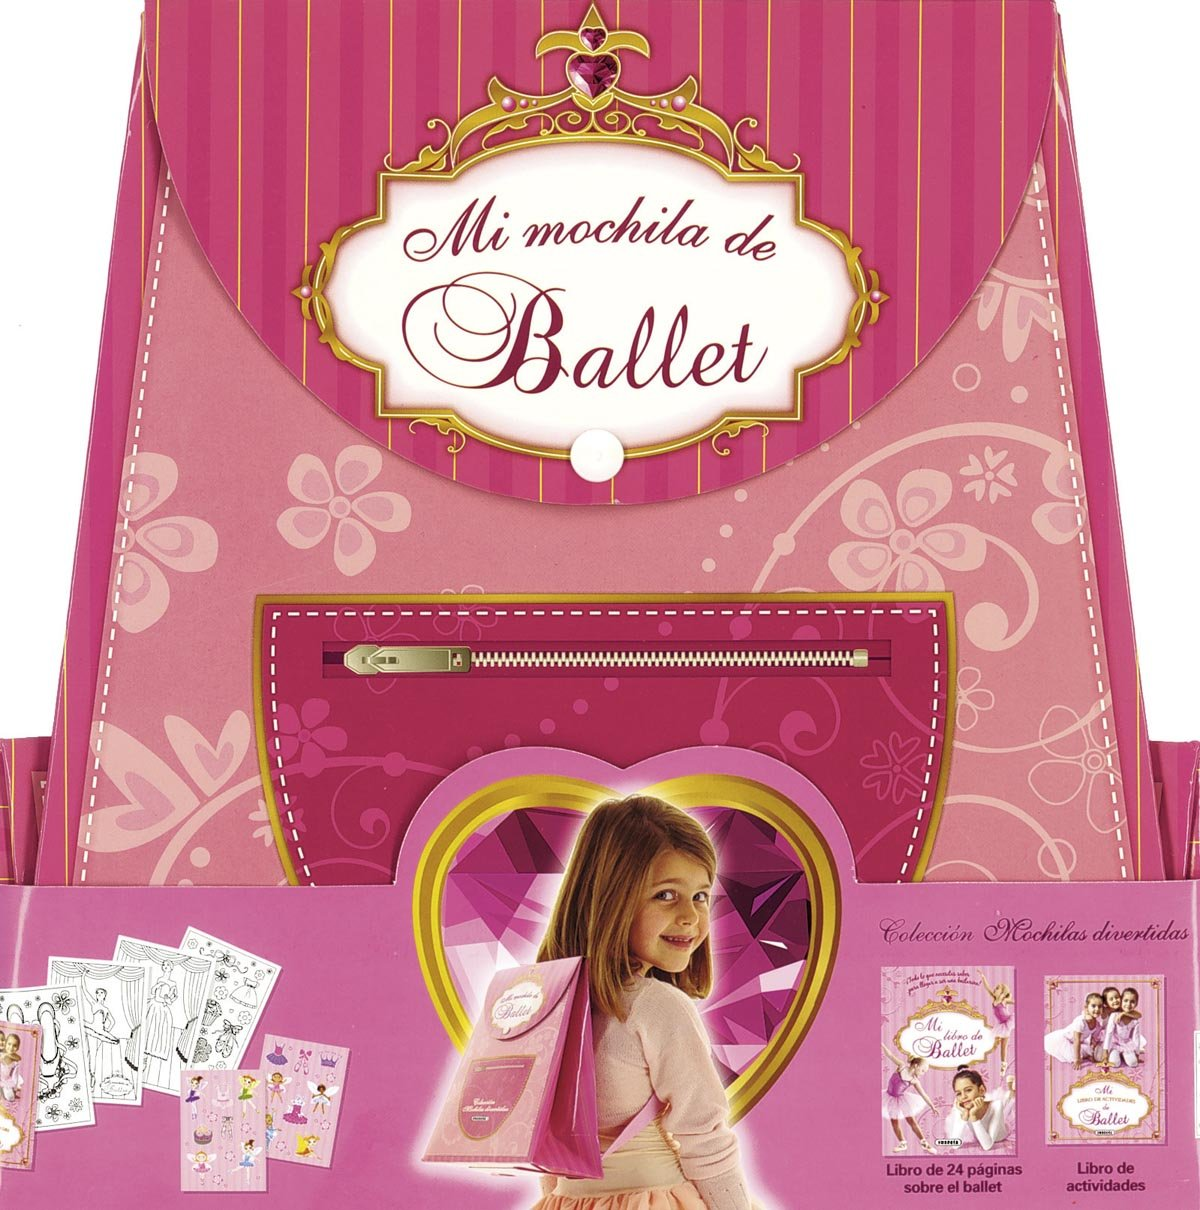 Mi mochila de ballet / My backpack of ballet (Spanish Edition) (Spanish) Hardcover – Illustrated, June 30, 2012